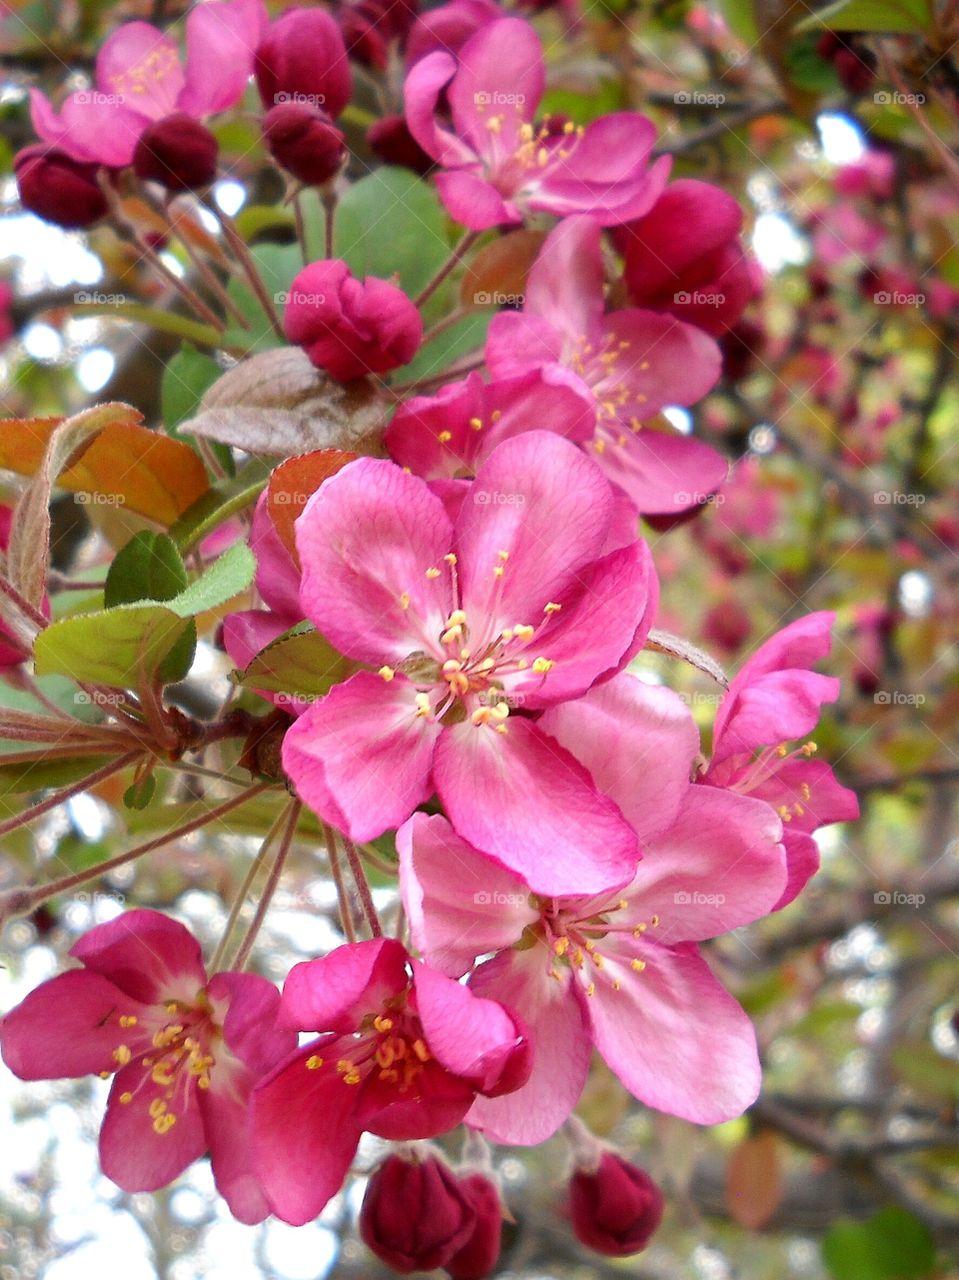 Pink Crabapple Blossoms